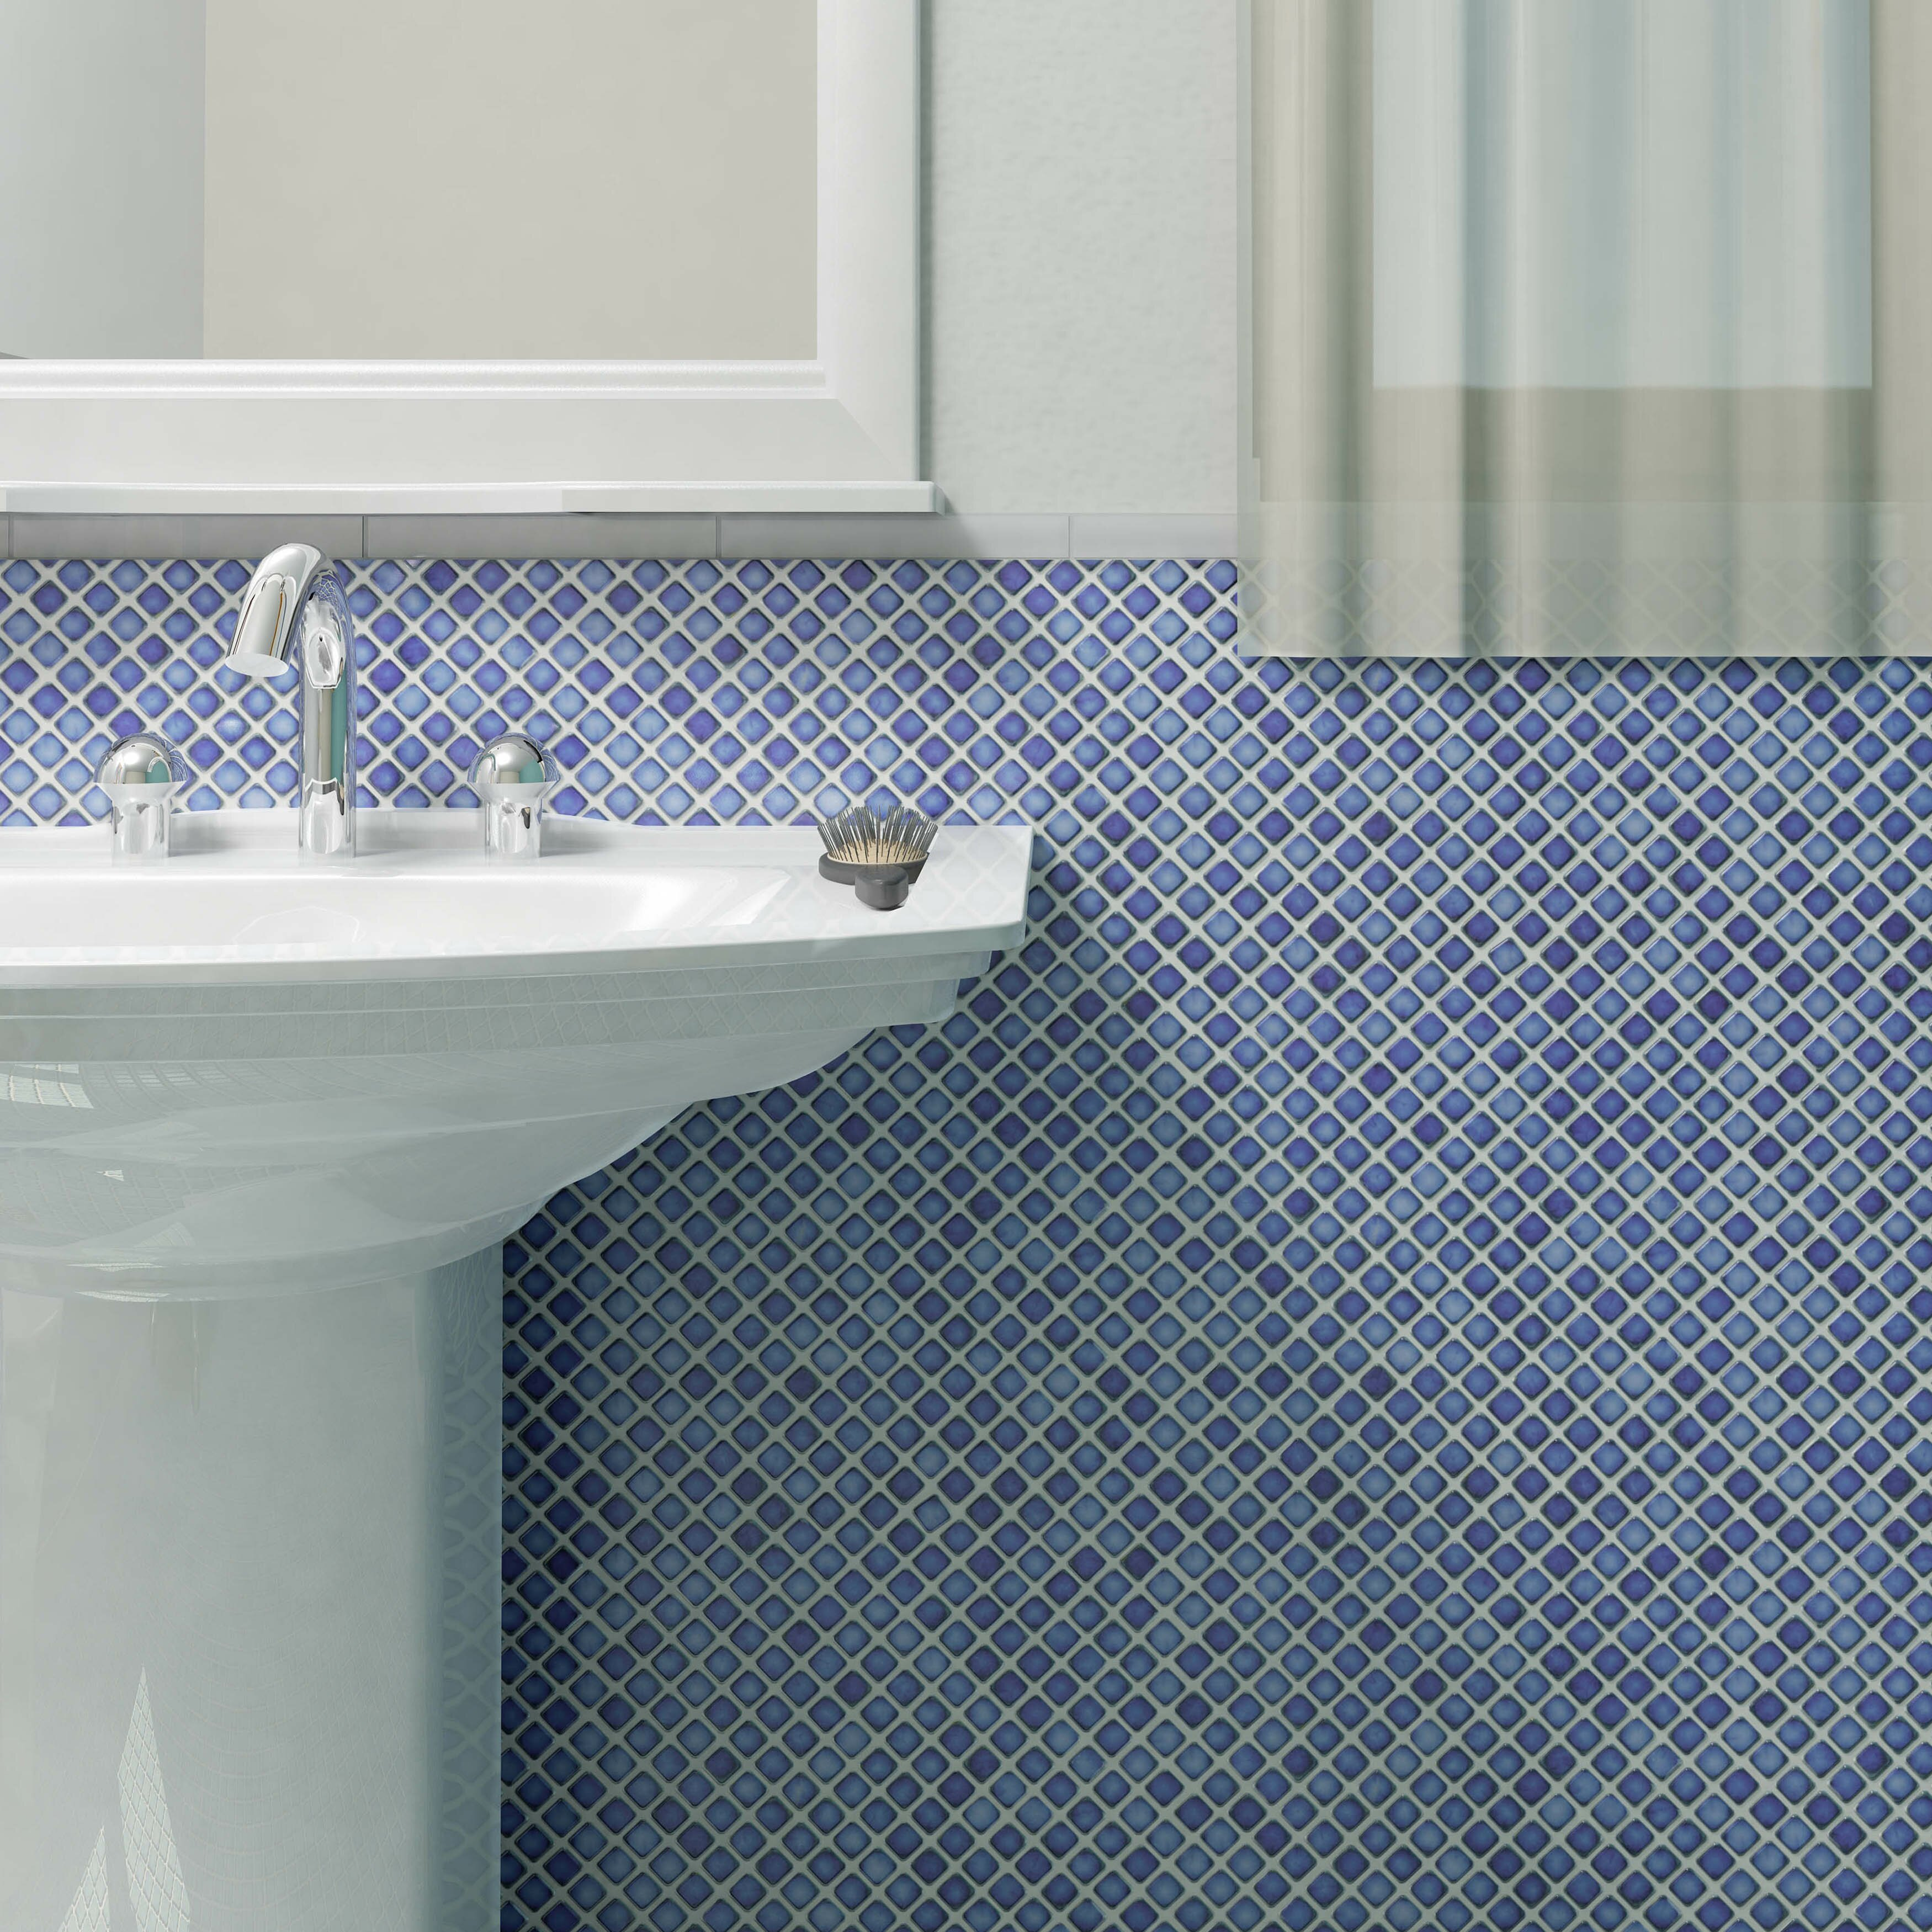 Nice Small Corner Mirror Bathroom Cabinet Big Painting Bathroom Vanity Pinterest Square Retro Pink Tile Bathroom Ideas Install A Bath Spout Old Flush Mount Bathroom Light With Fan ColouredWestern Rustic Bathroom Lighting EliteTile Gem 0.71\u0026quot; X 0.71\u0026quot; Porcelain Mosaic Tile In Glossy ..